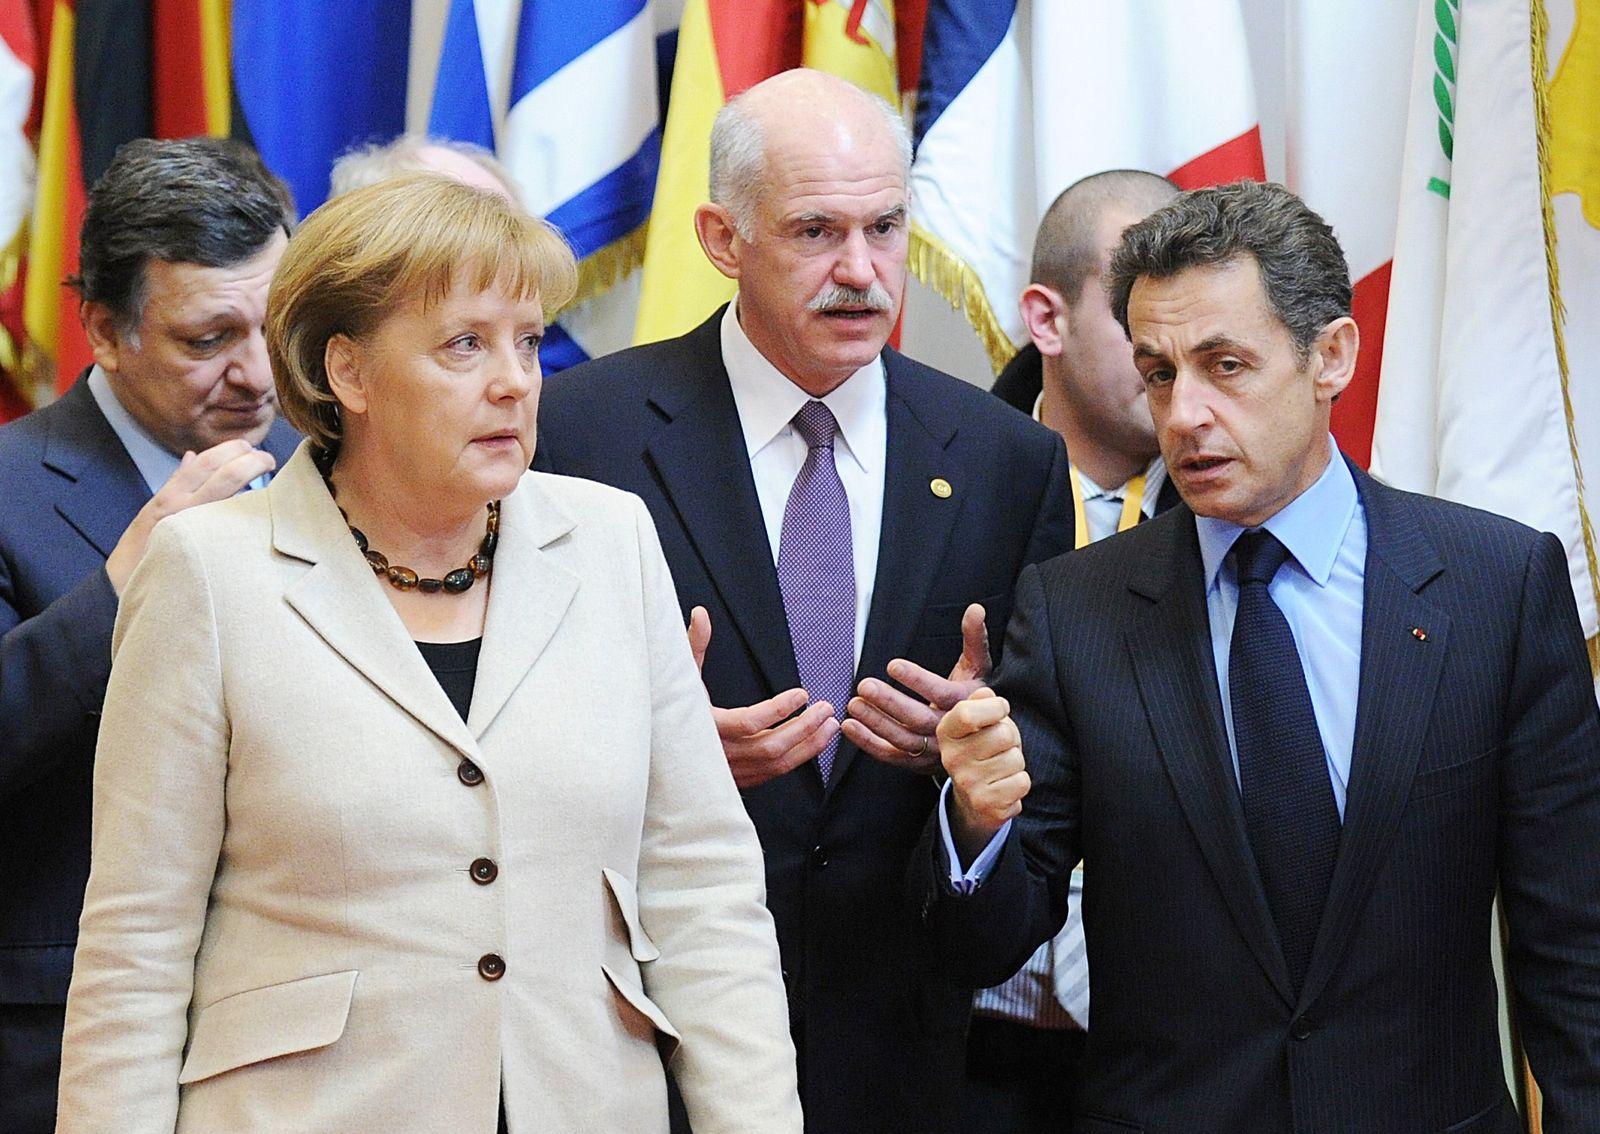 EU-SUMMIT-ECONOMY